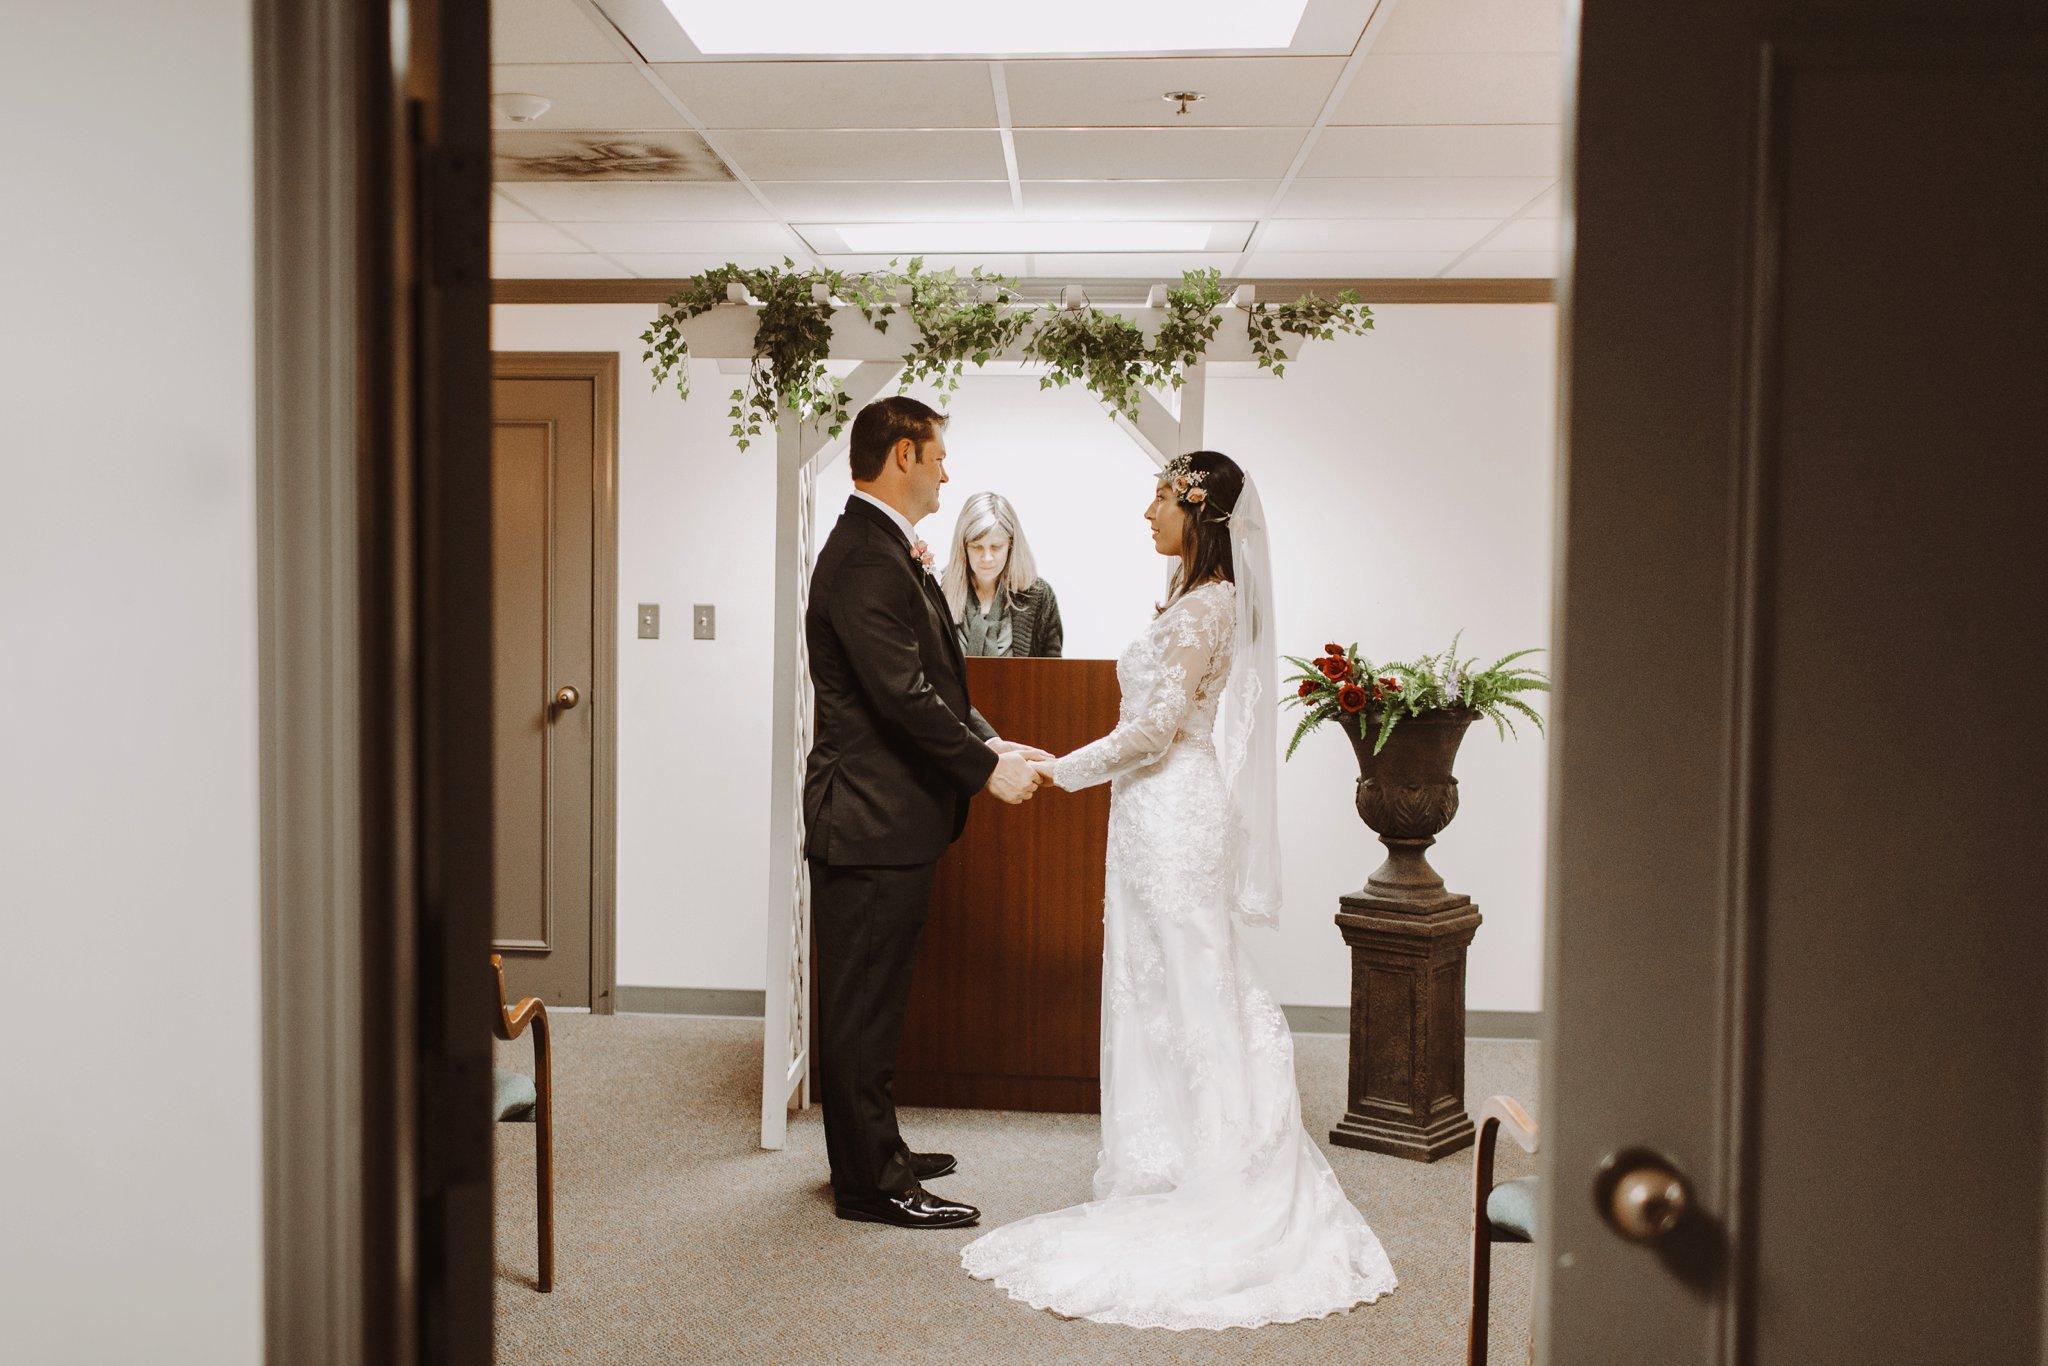 Historic Ellicott City Maryland Courthouse Elopement Wedding Kate Ann Photography 1108